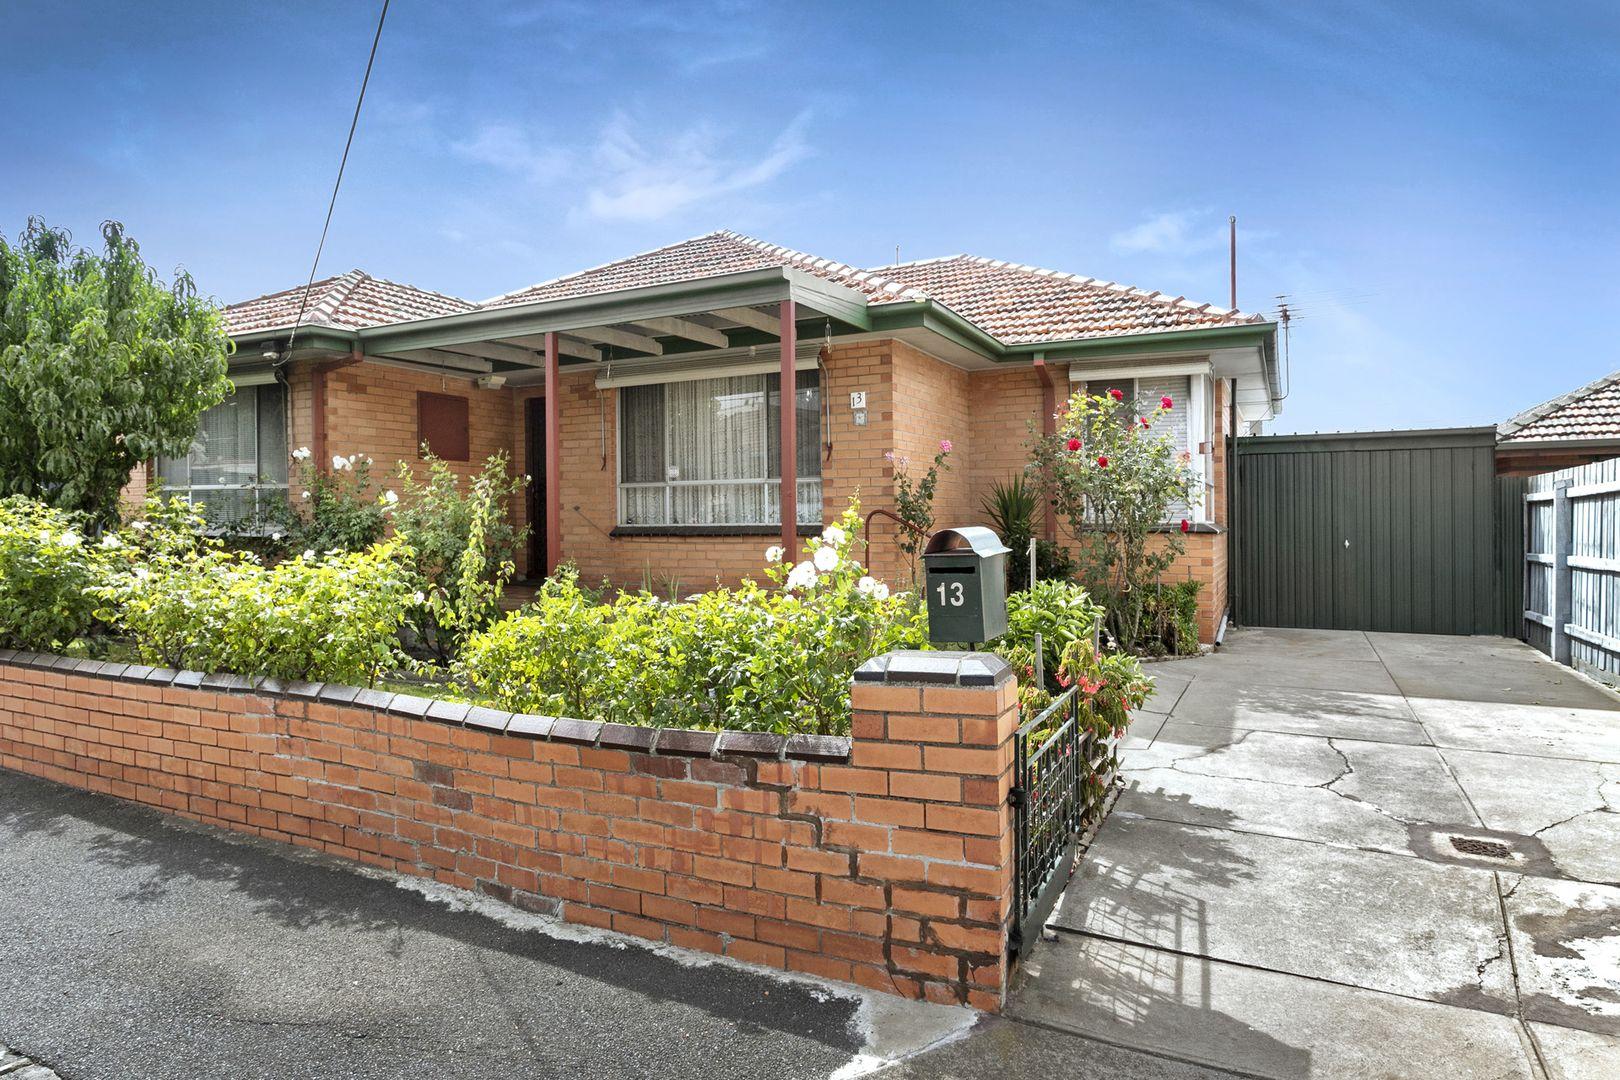 13 Southampton Street, Footscray VIC 3011, Image 0